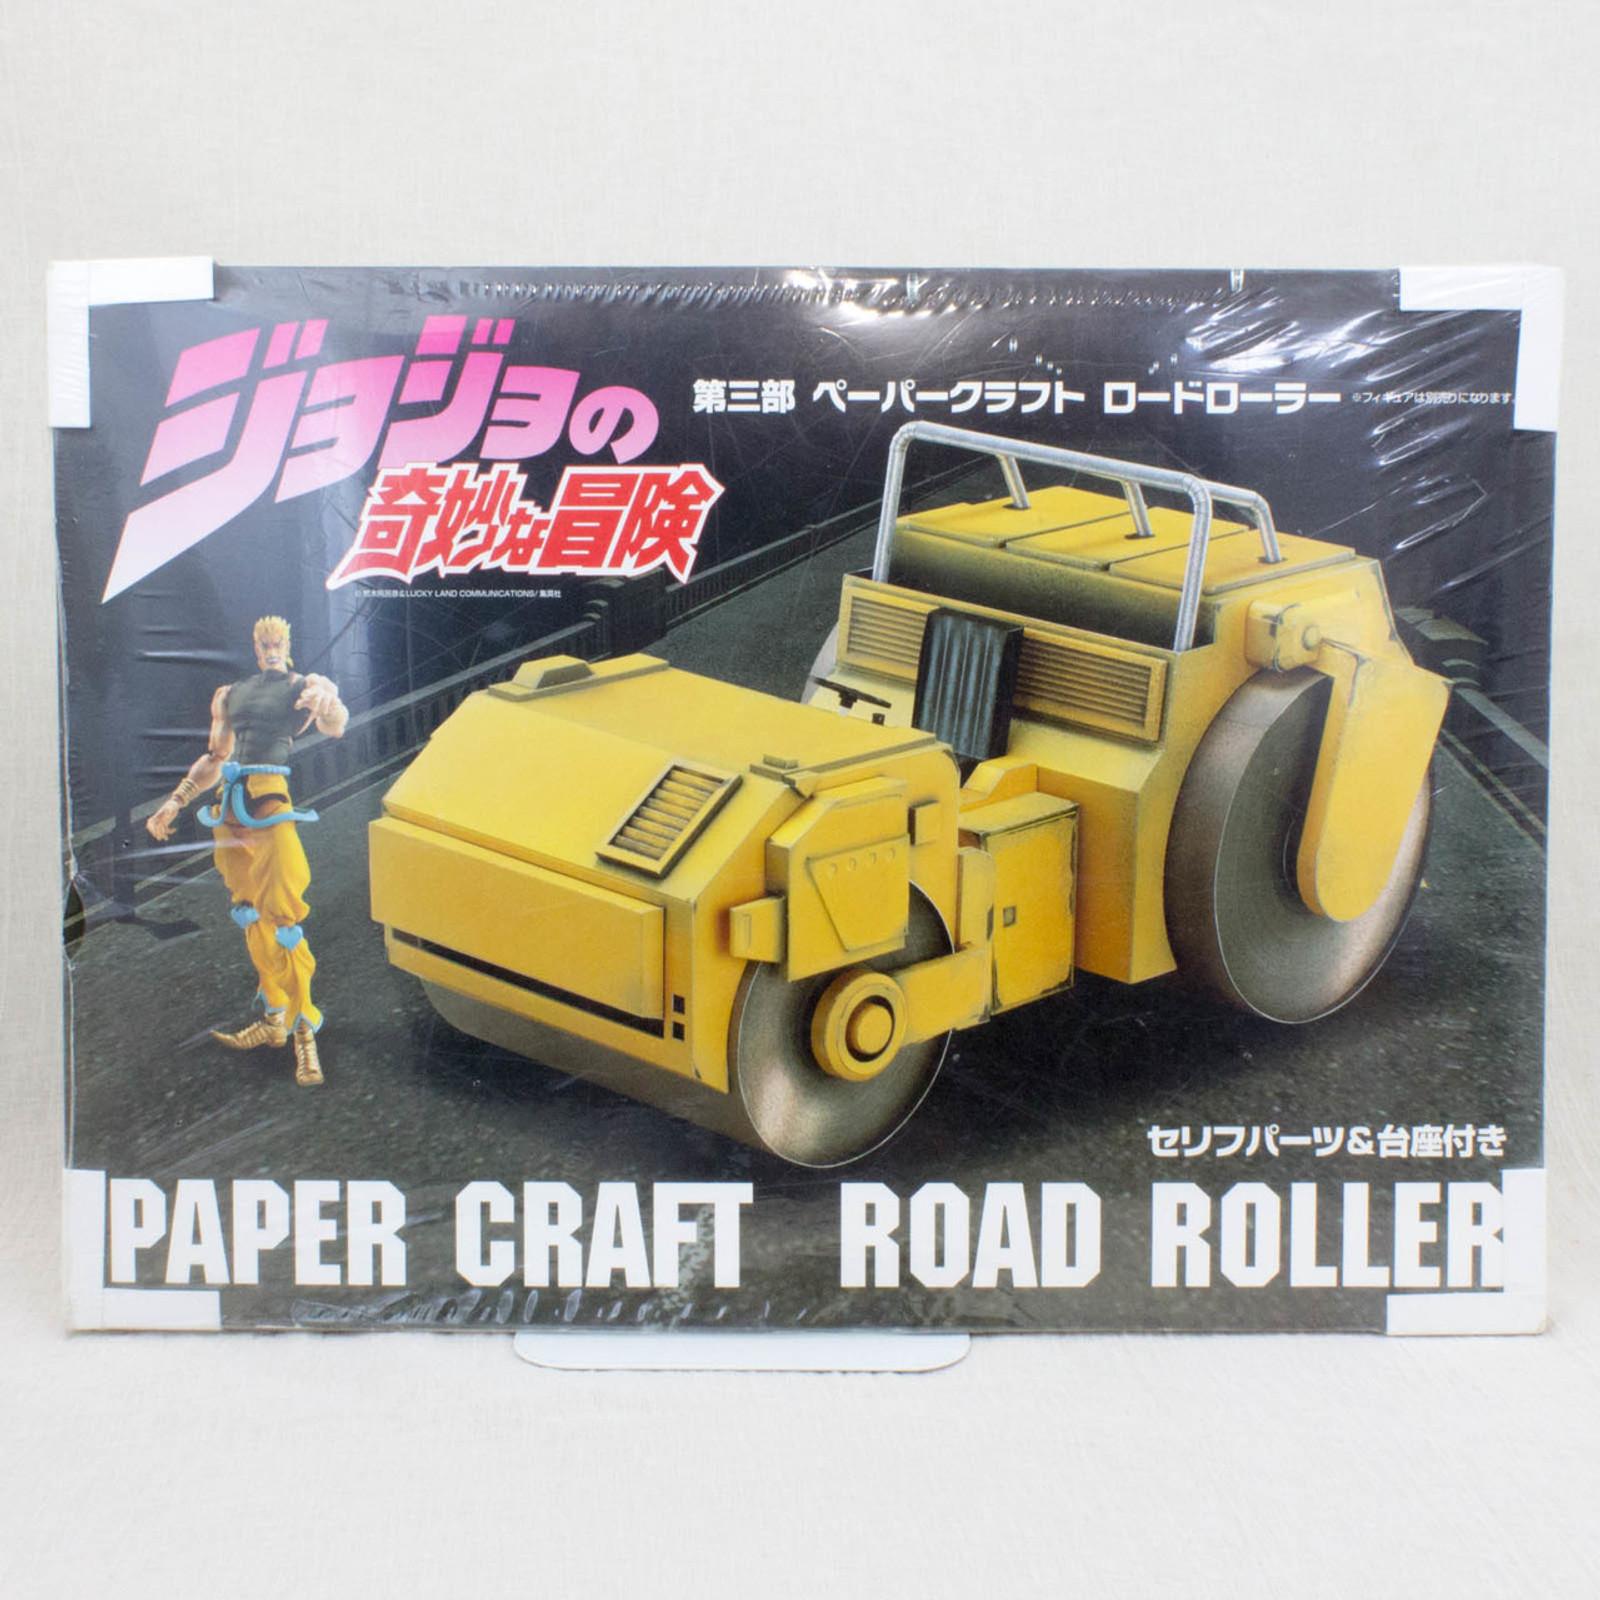 JoJo's Bizarre Adventure Papaer Craft Dio's Road Roller Medicos JAPAN ANIME